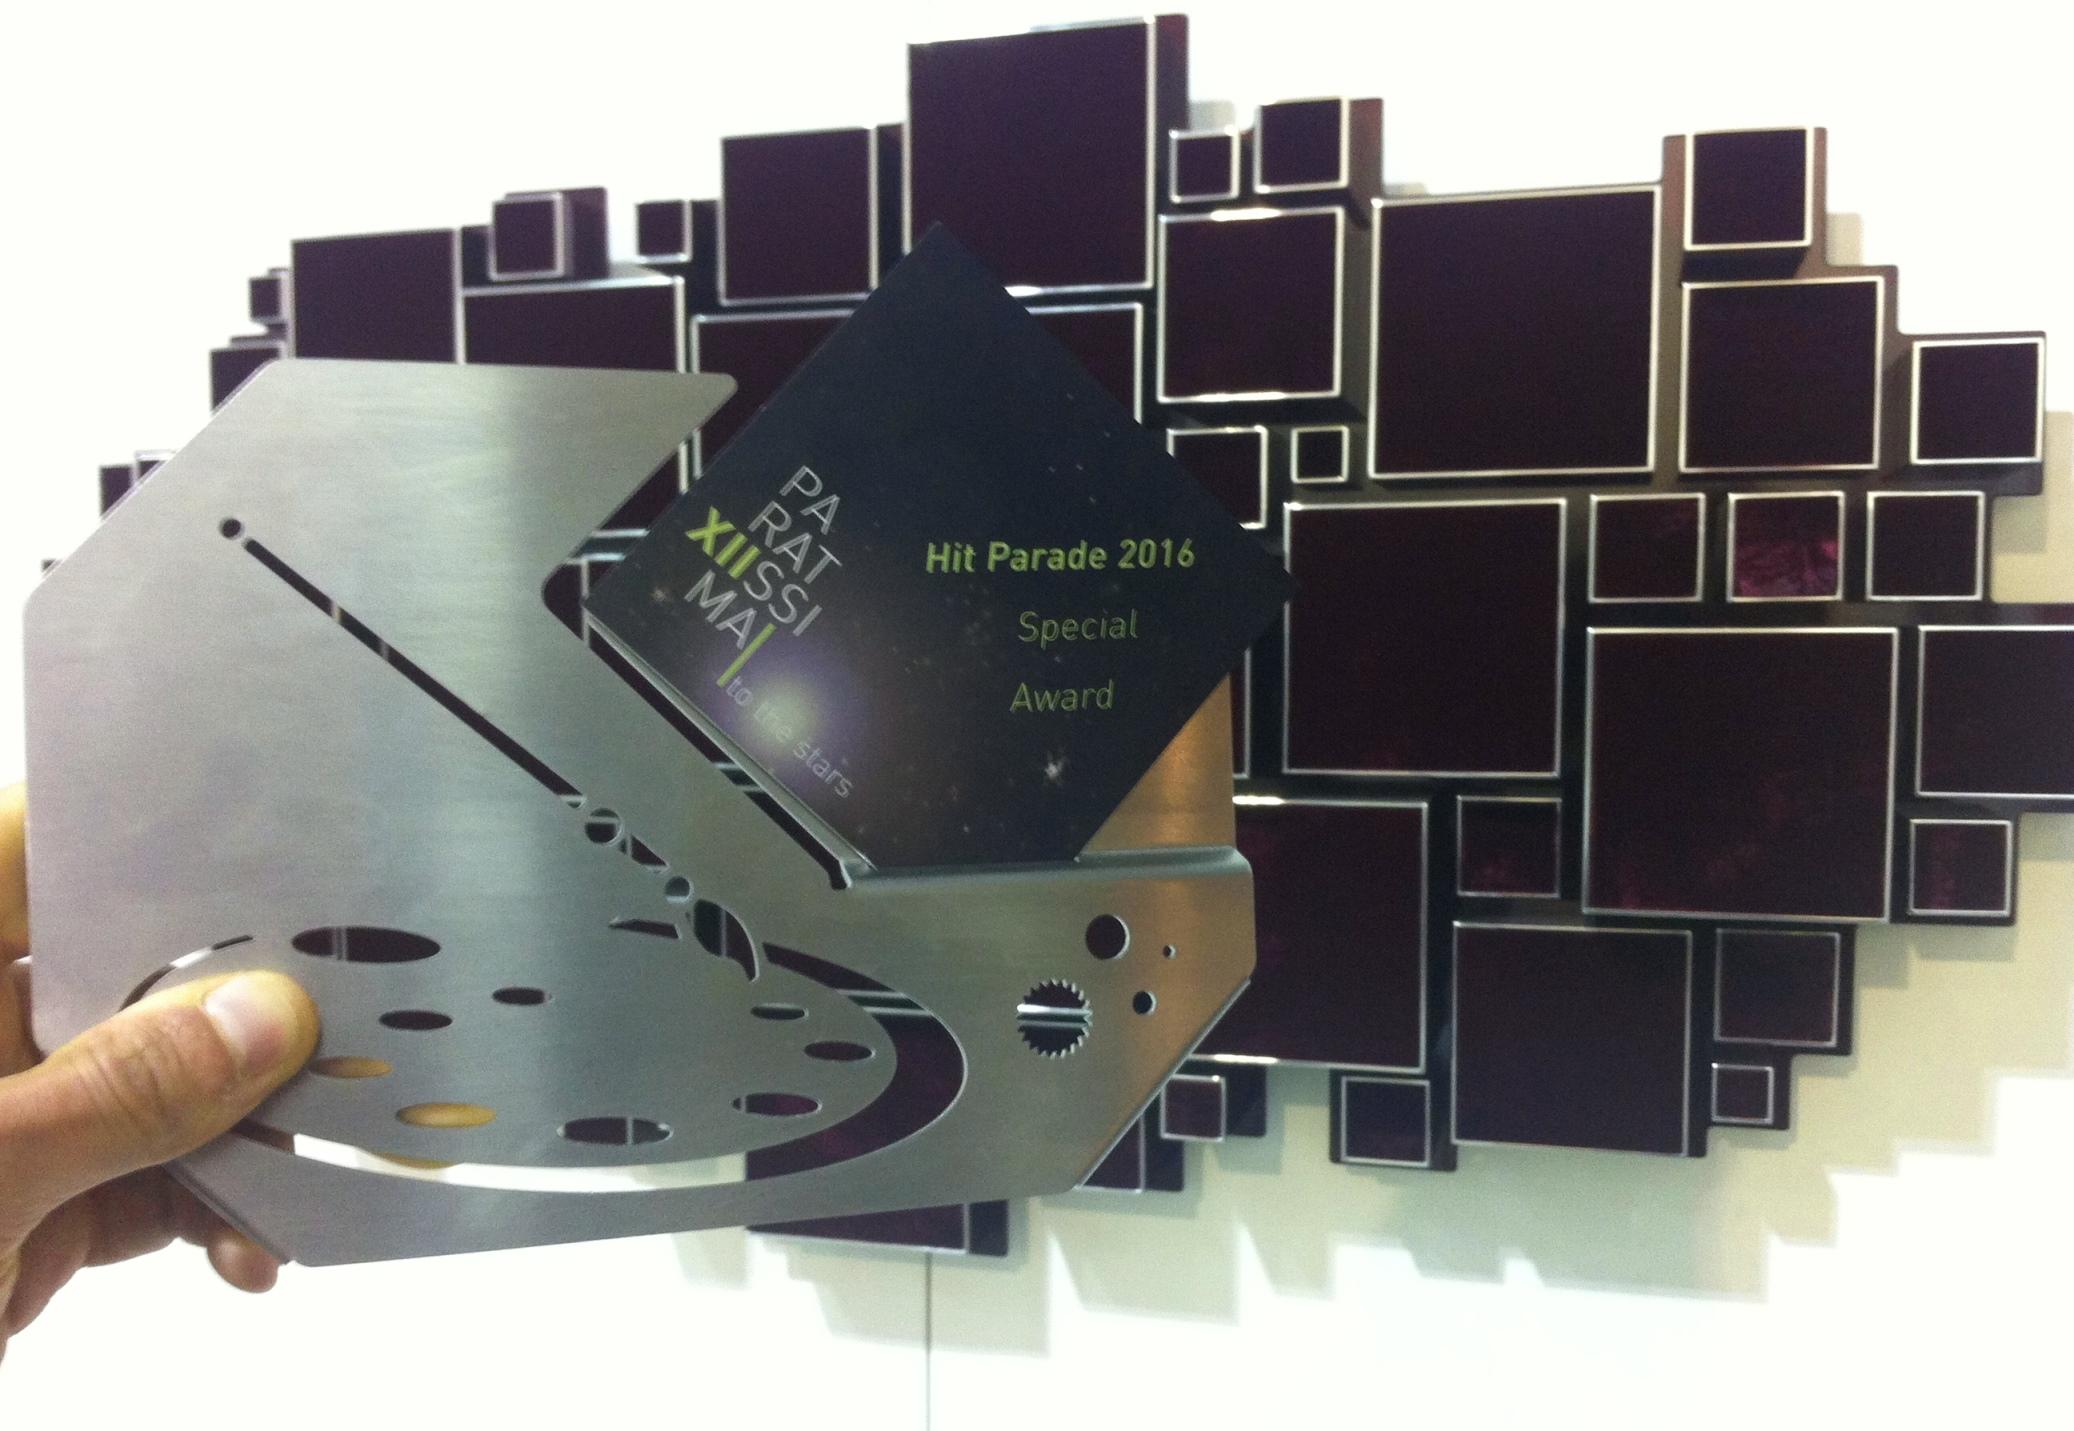 Special Award!